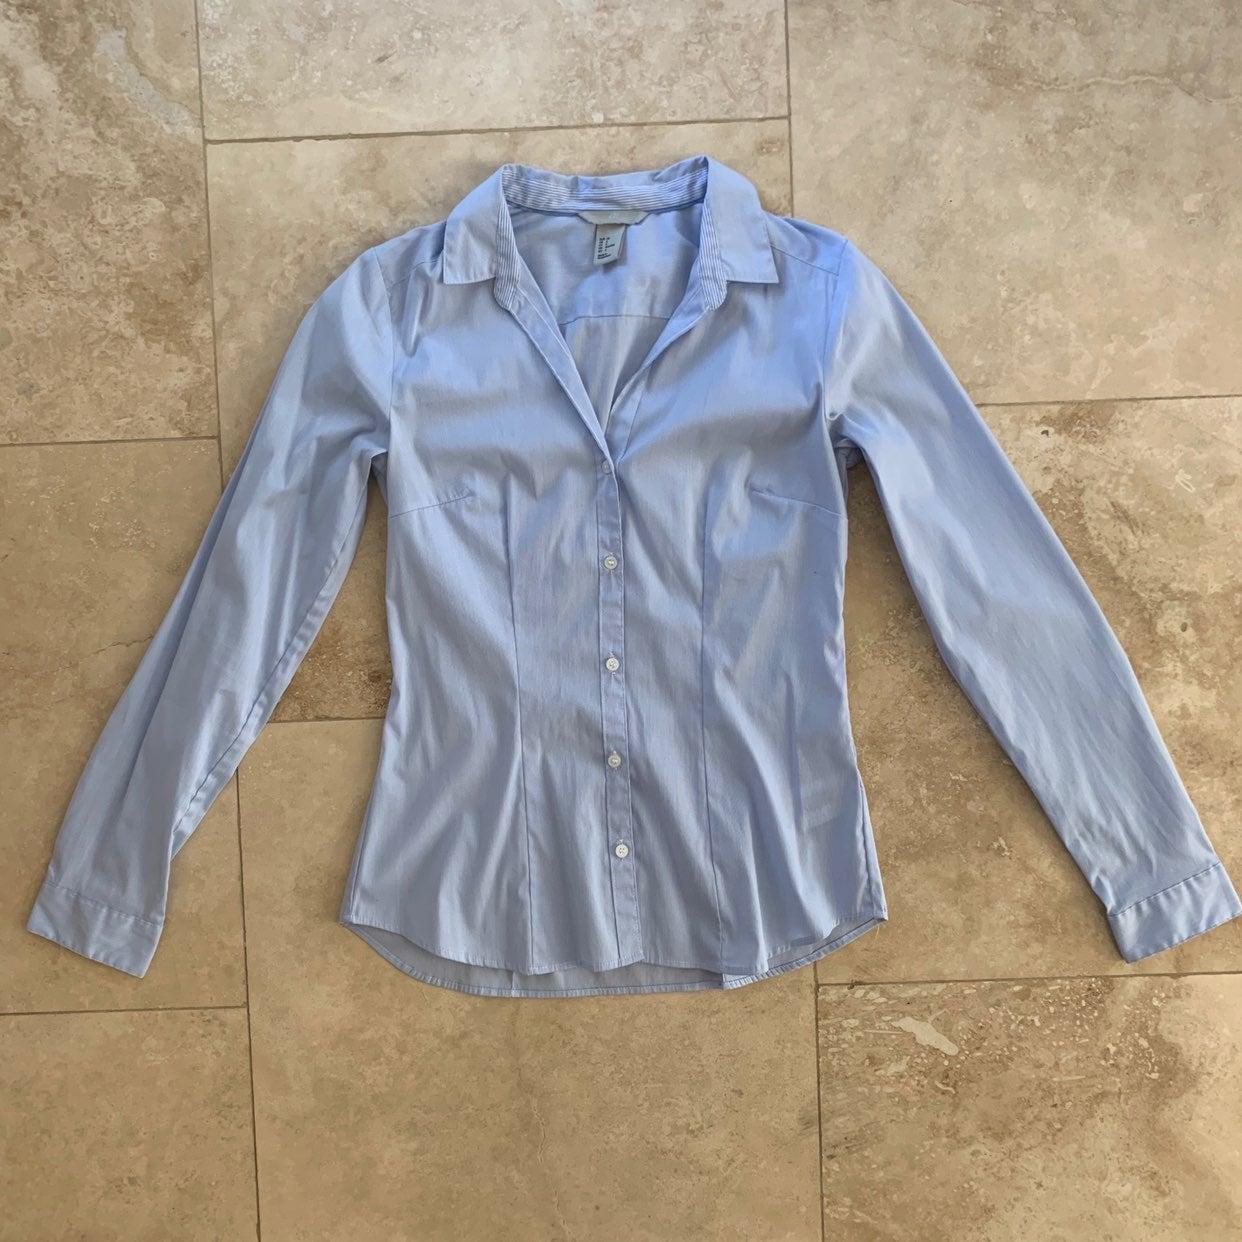 H&M button down collared dress shirt